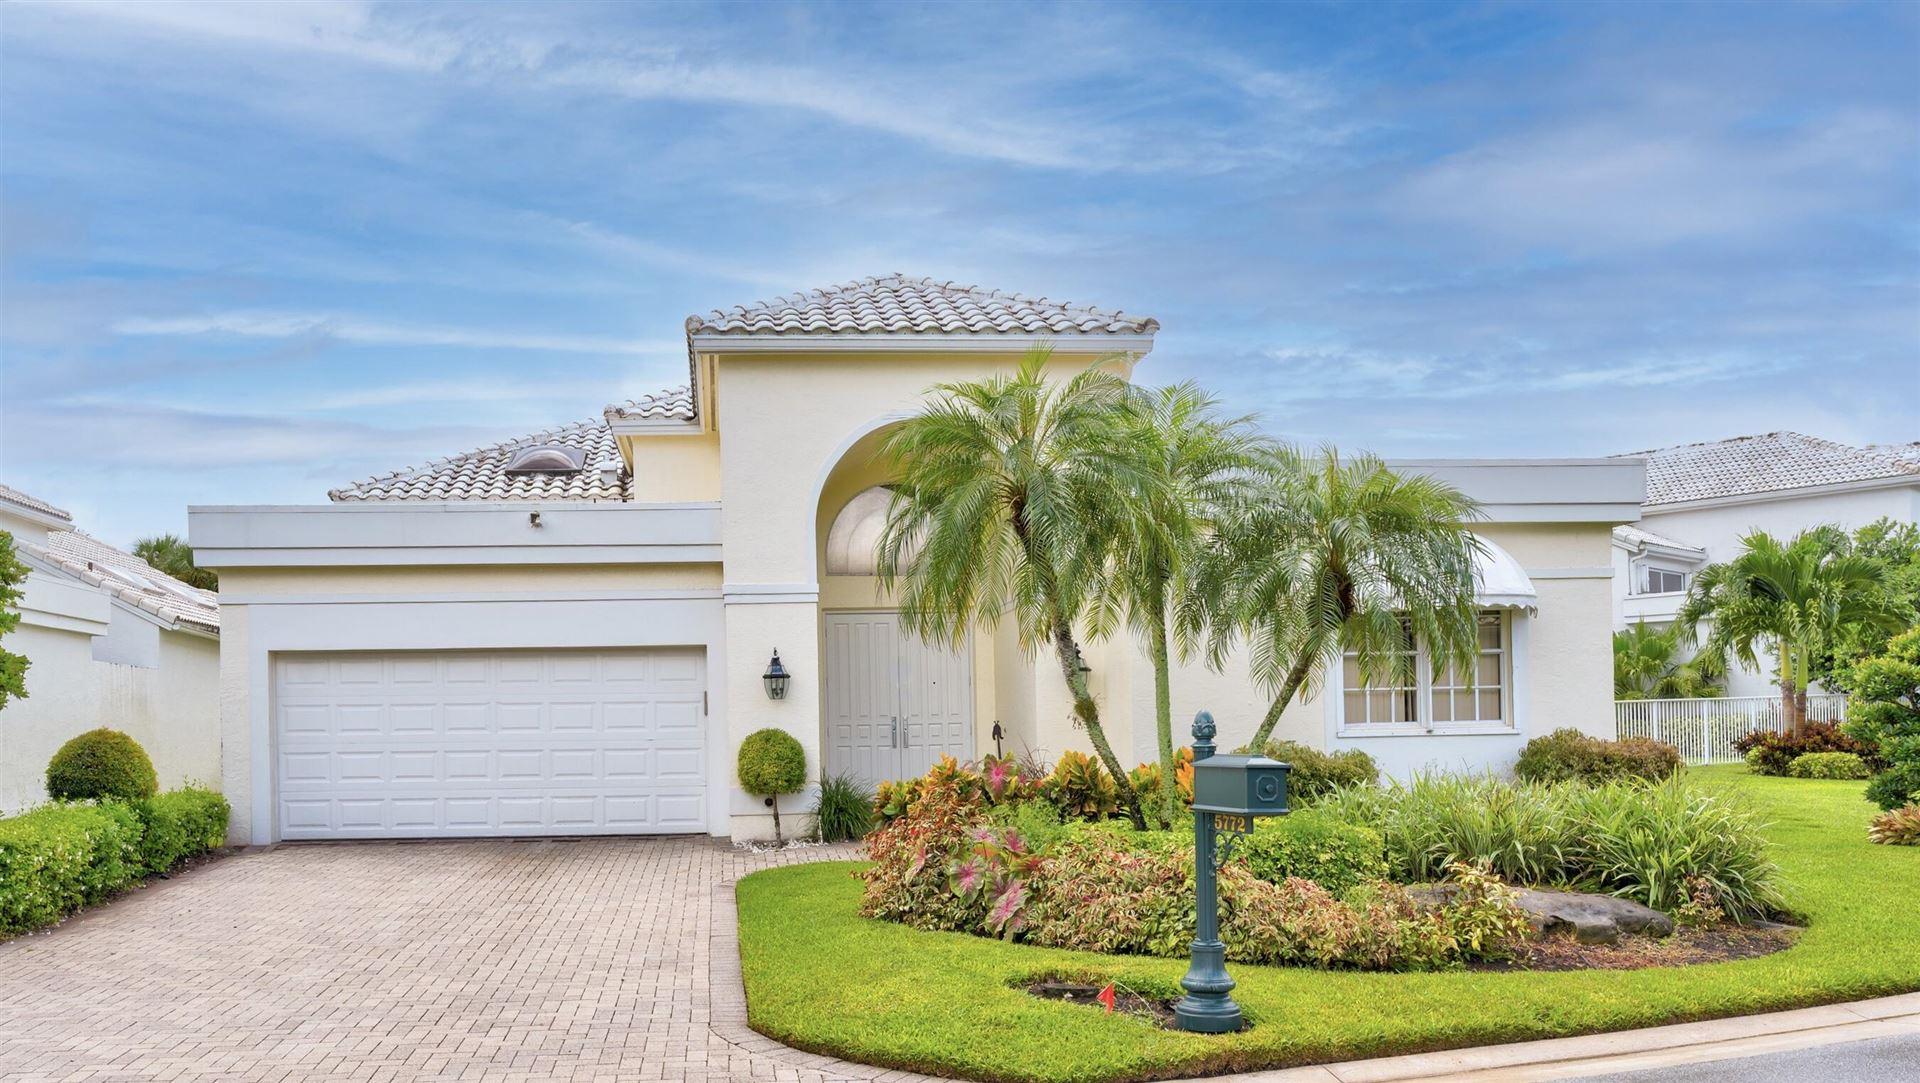 5772 Waterford Way, Boca Raton, FL 33496 - MLS#: RX-10747173